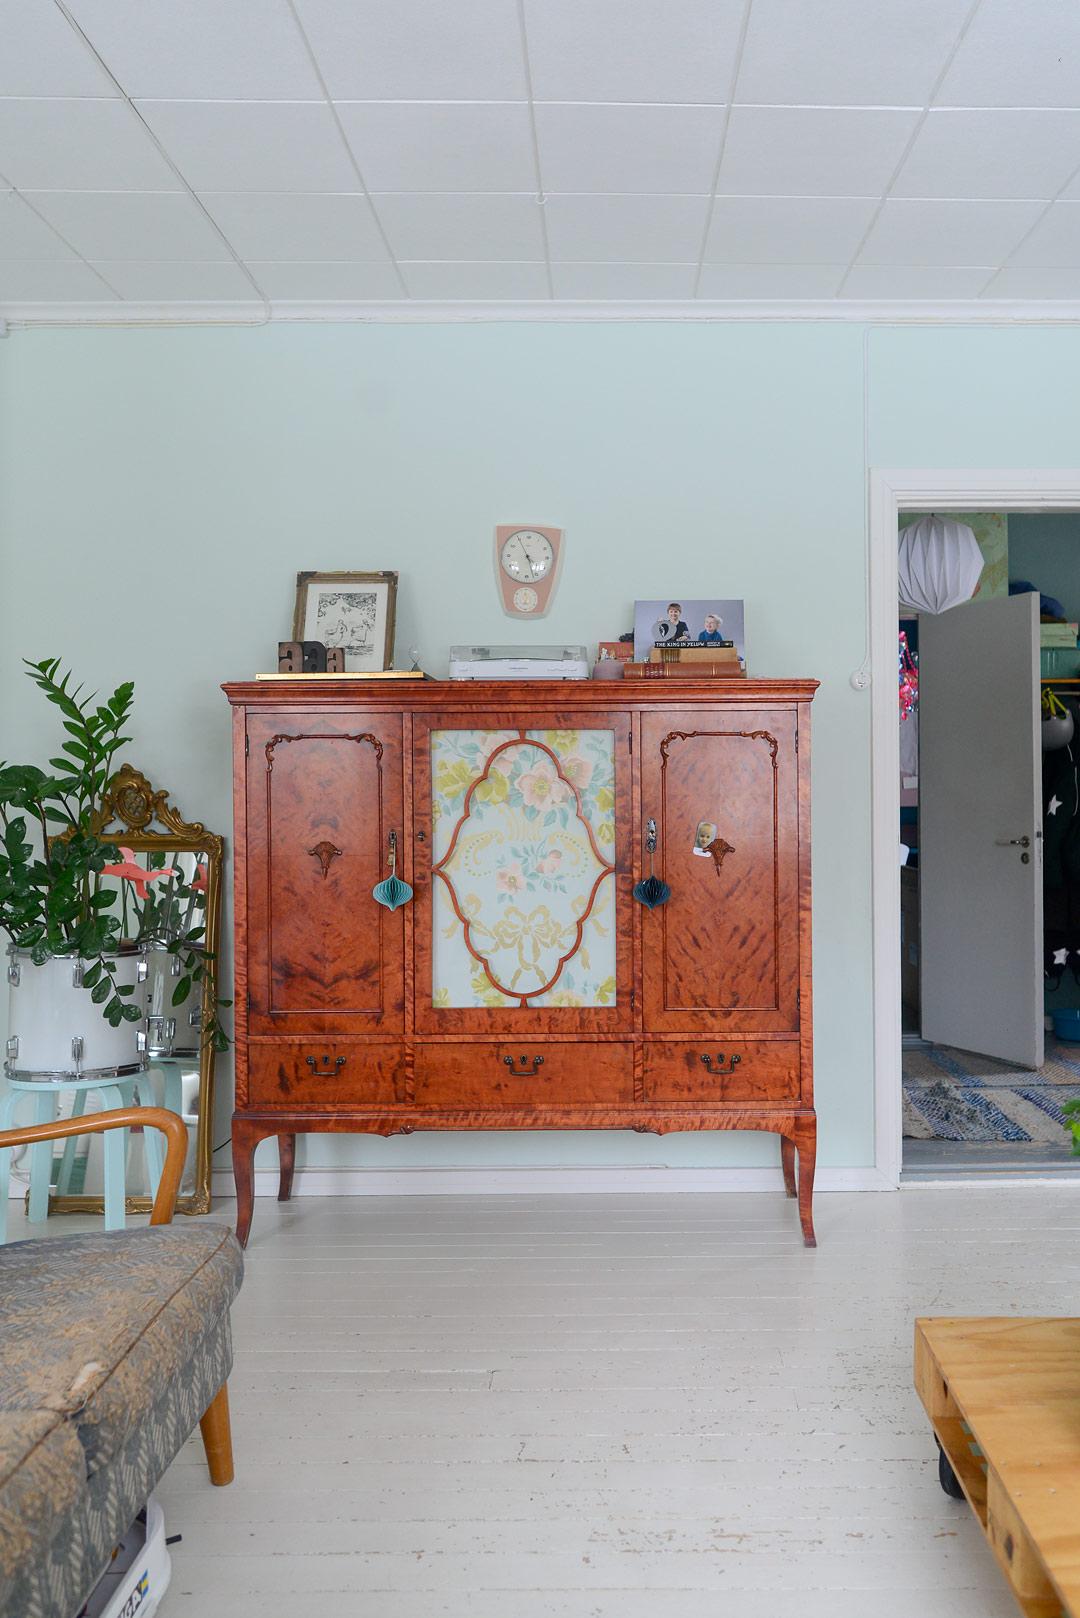 DIY and 1950's vintage decor